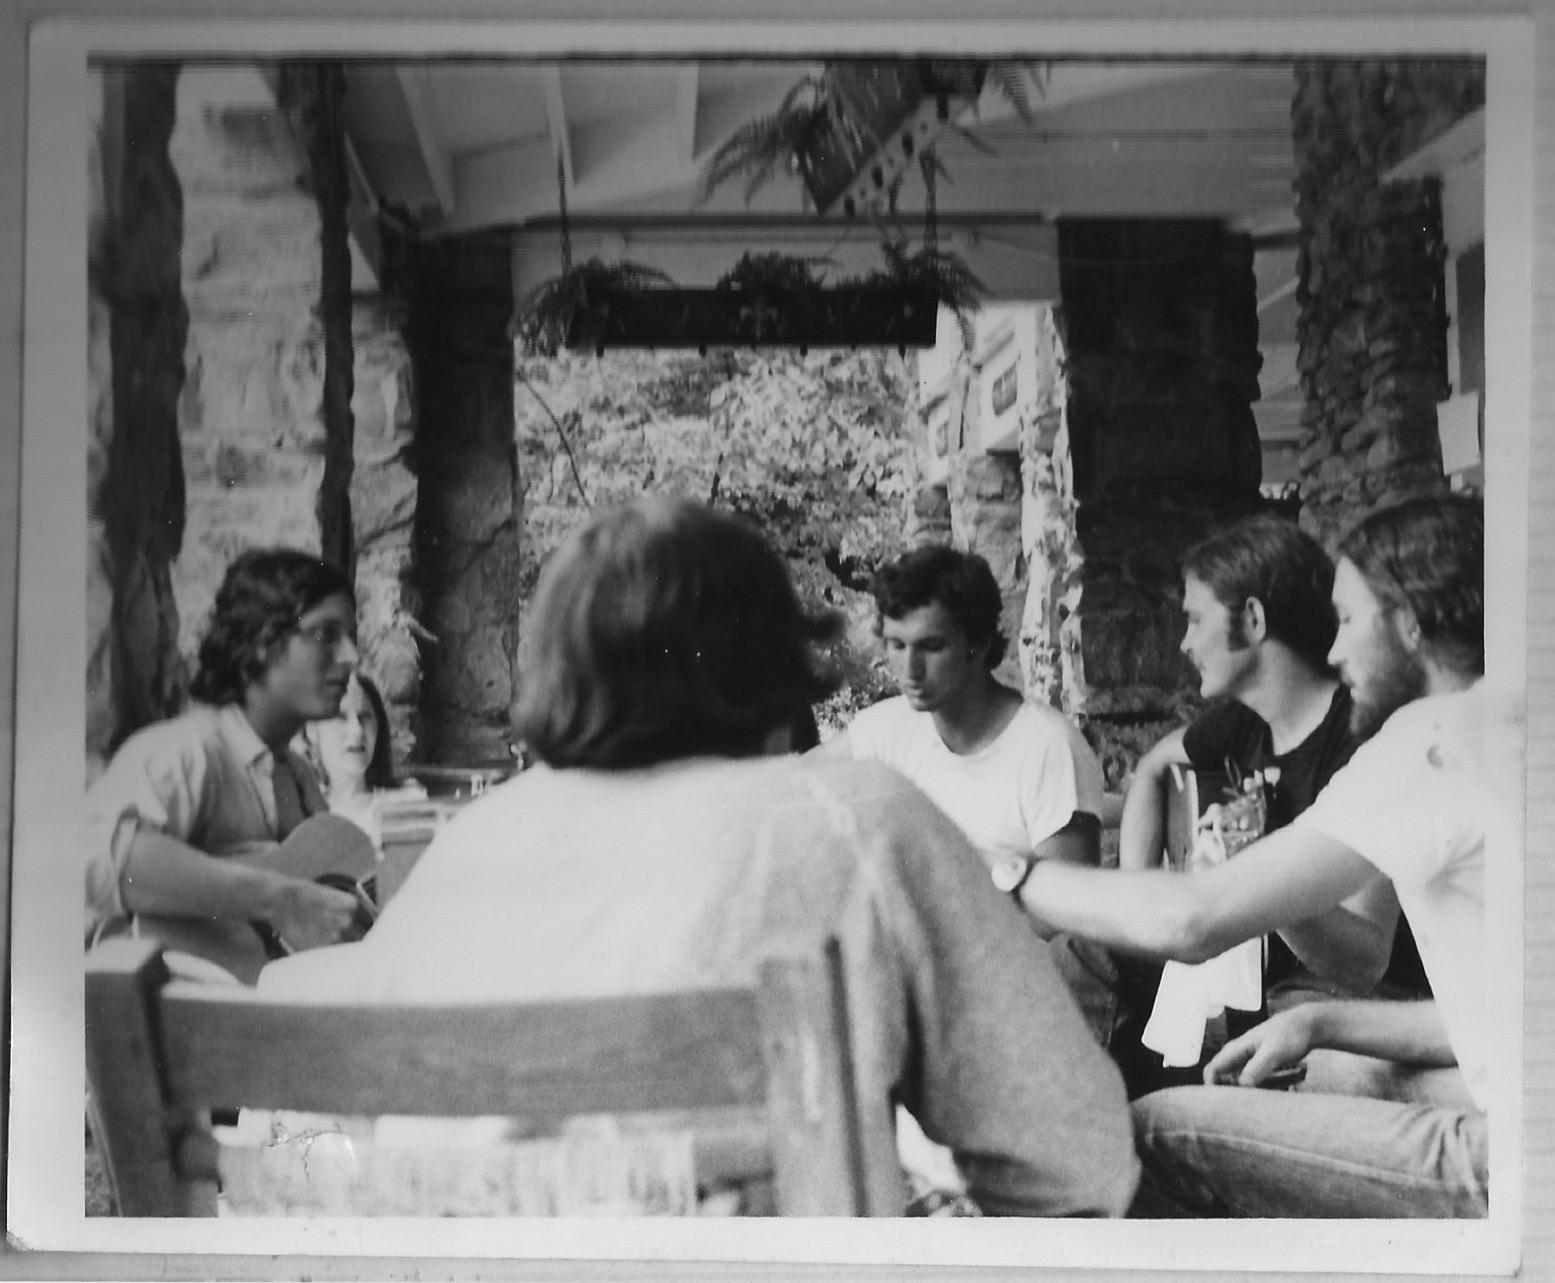 Cosmic Jam, 1973(?) - Montreat, NC - Porch of Left Banke